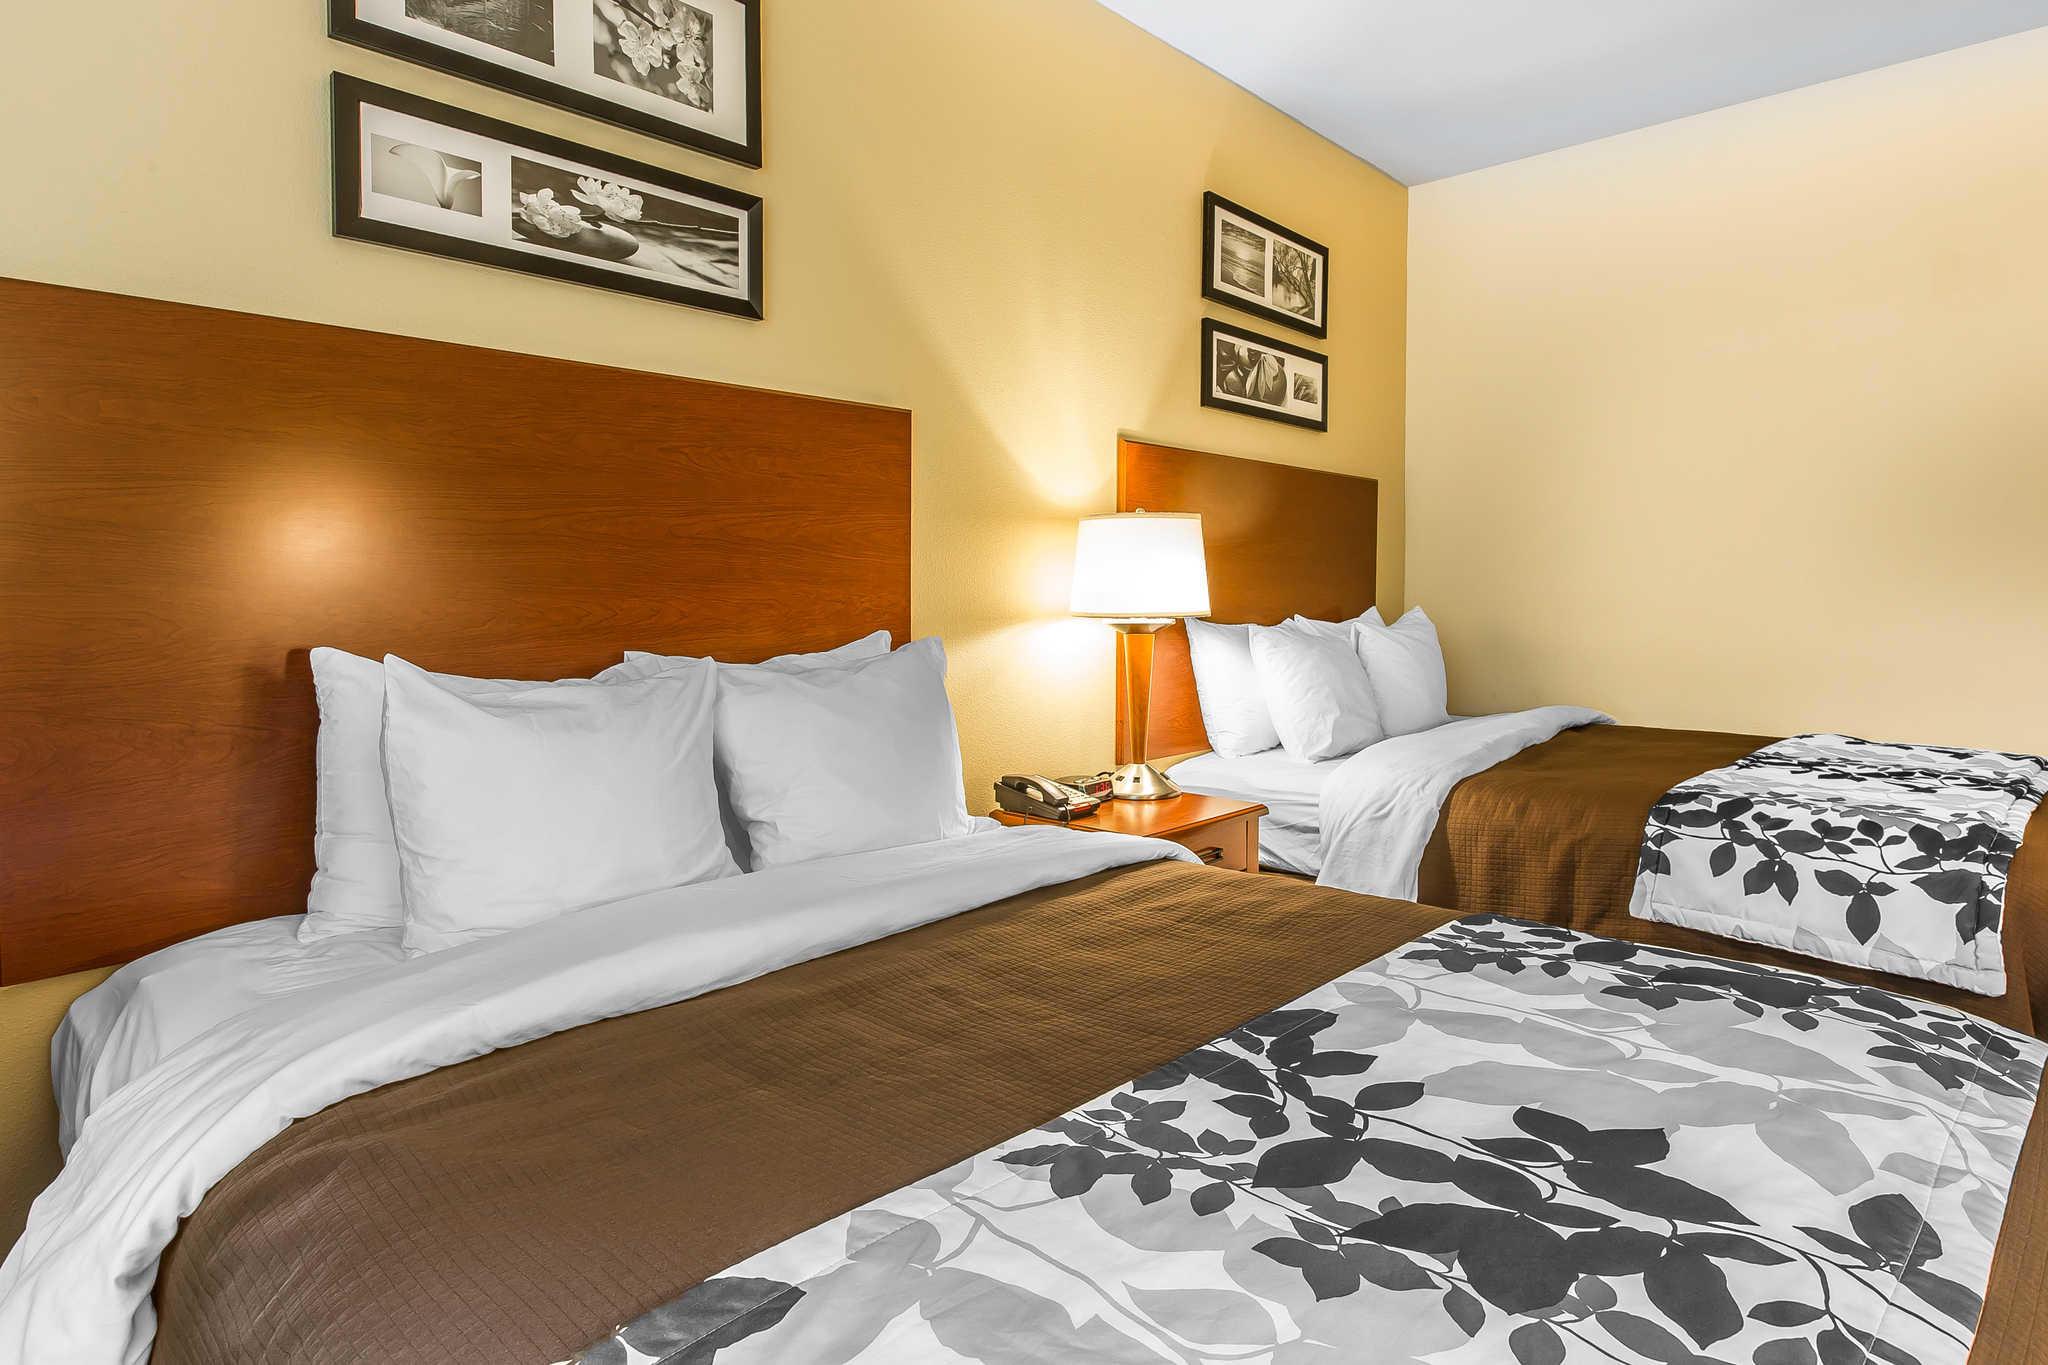 Sleep Inn & Suites At Kennesaw State University image 11